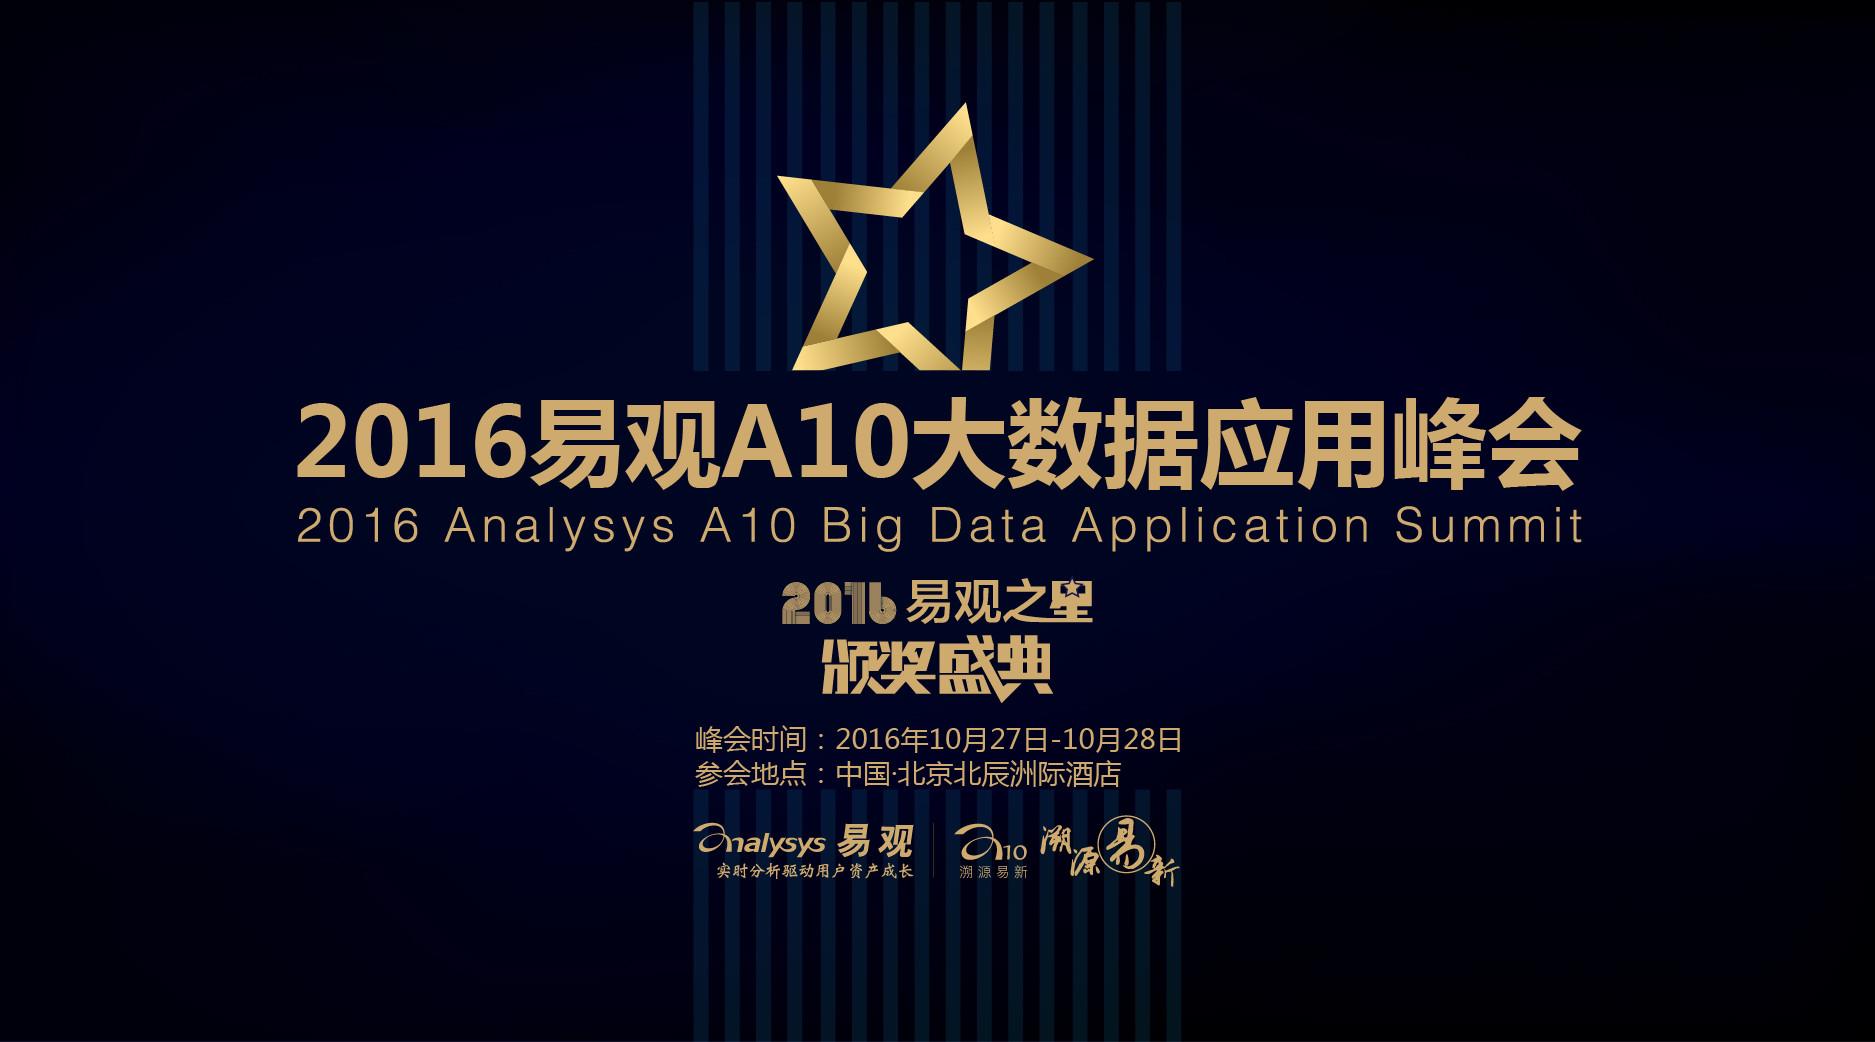 A10峰会聚力改革 易观变身数据产业合伙人